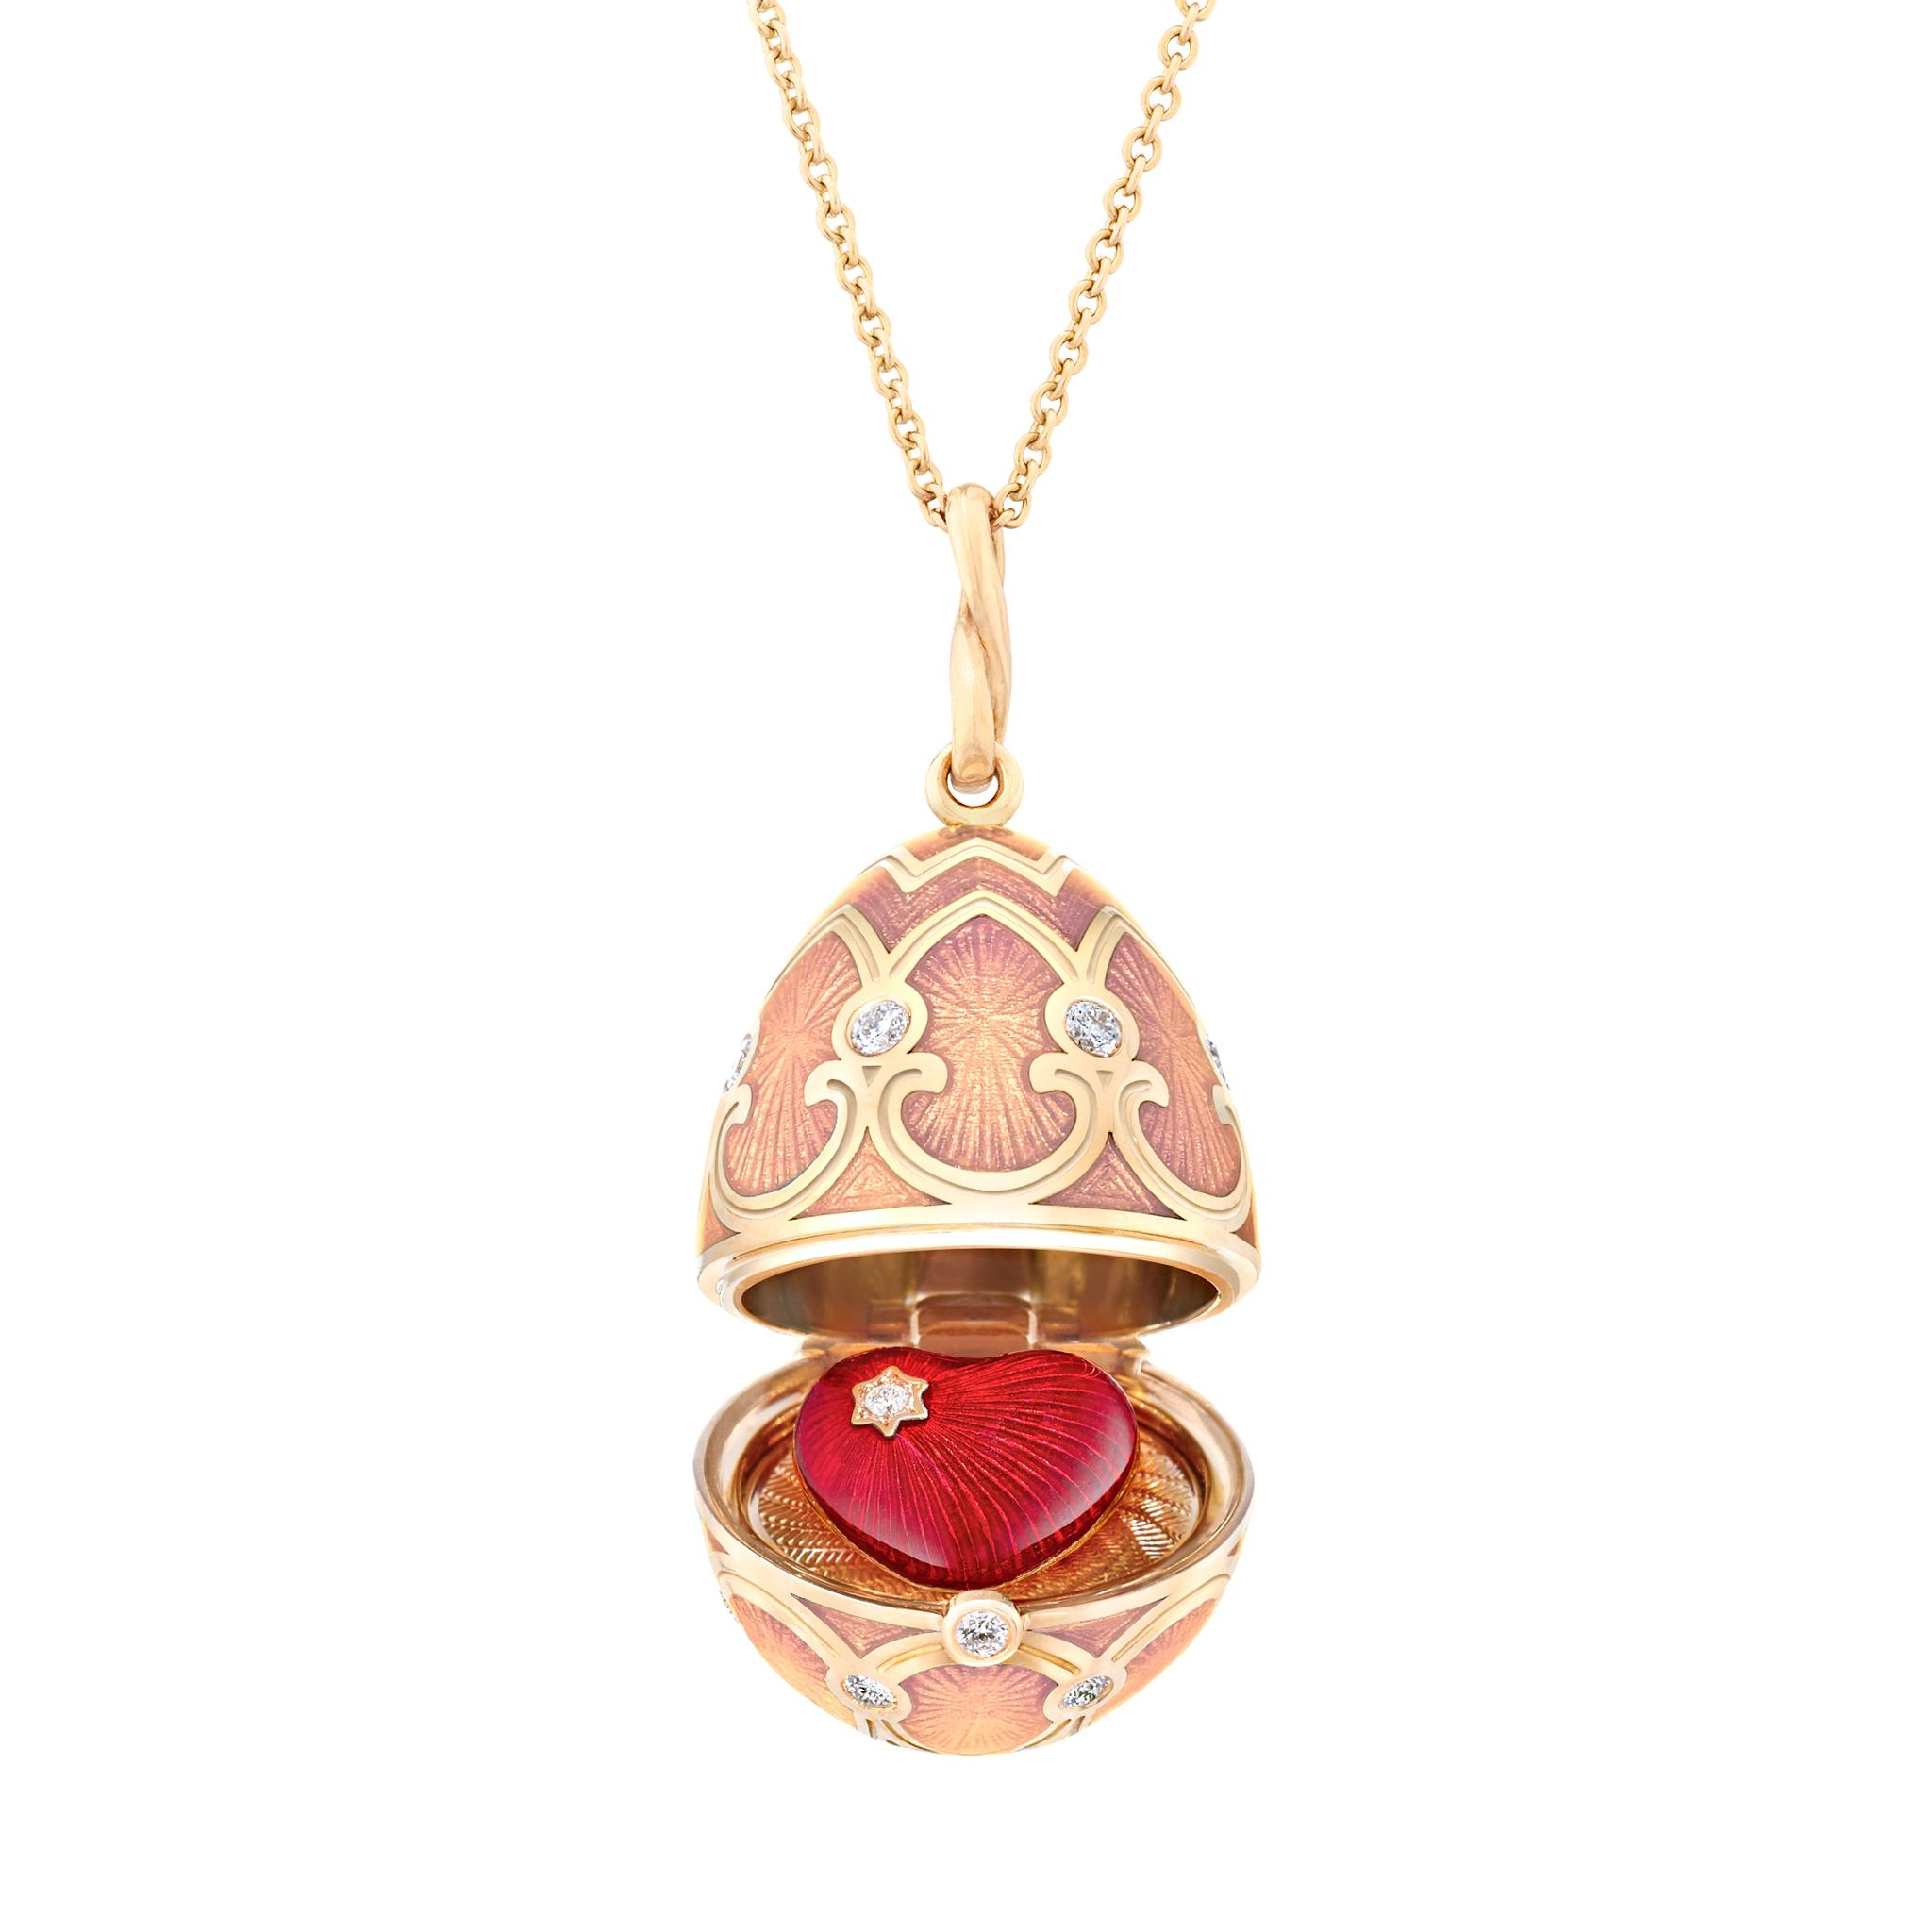 Fabergé法贝热复古粉色彩蛋挂坠